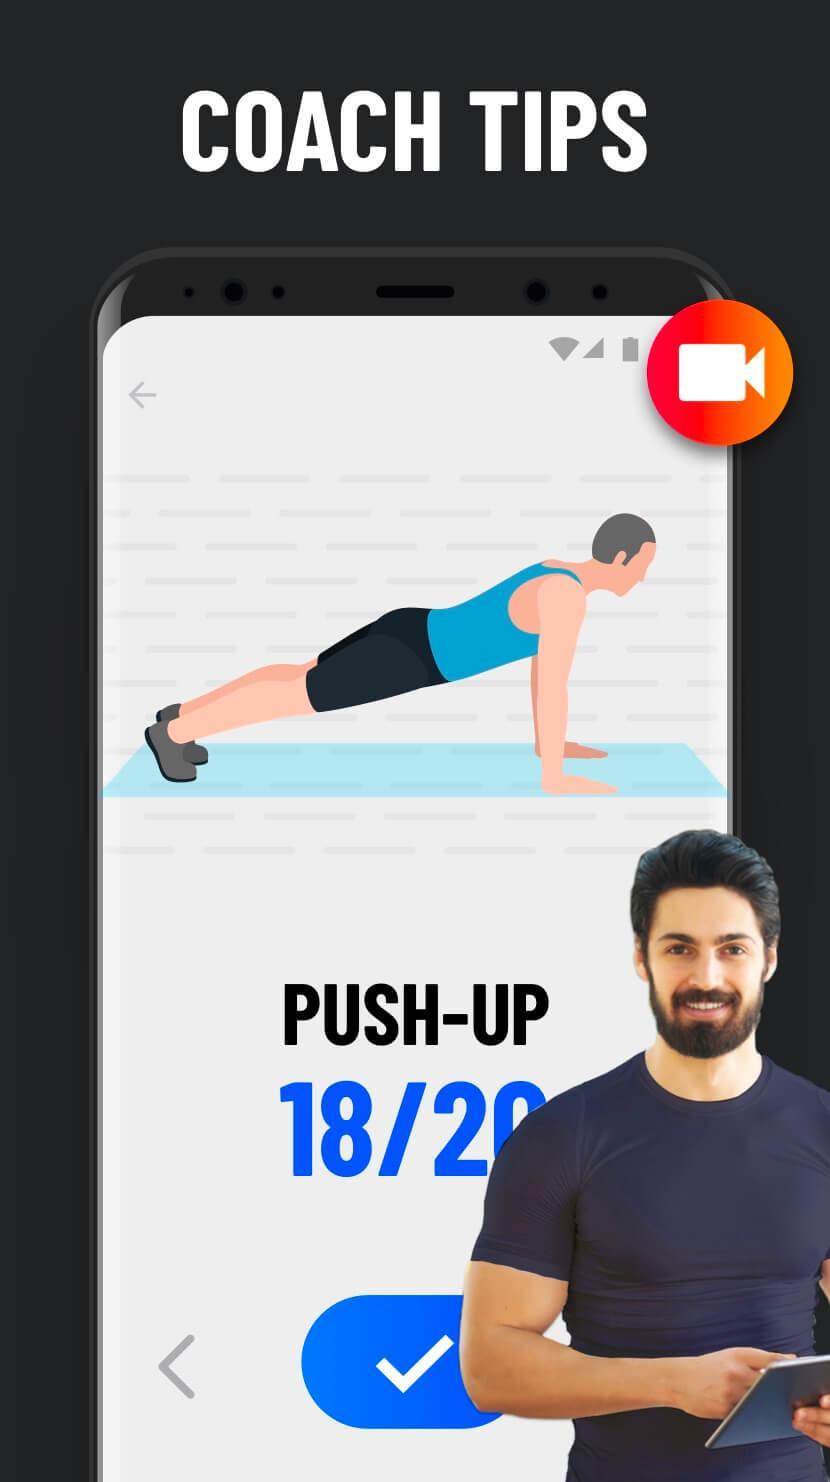 Home Workout No Equipment 1.1.2 Screenshot 3